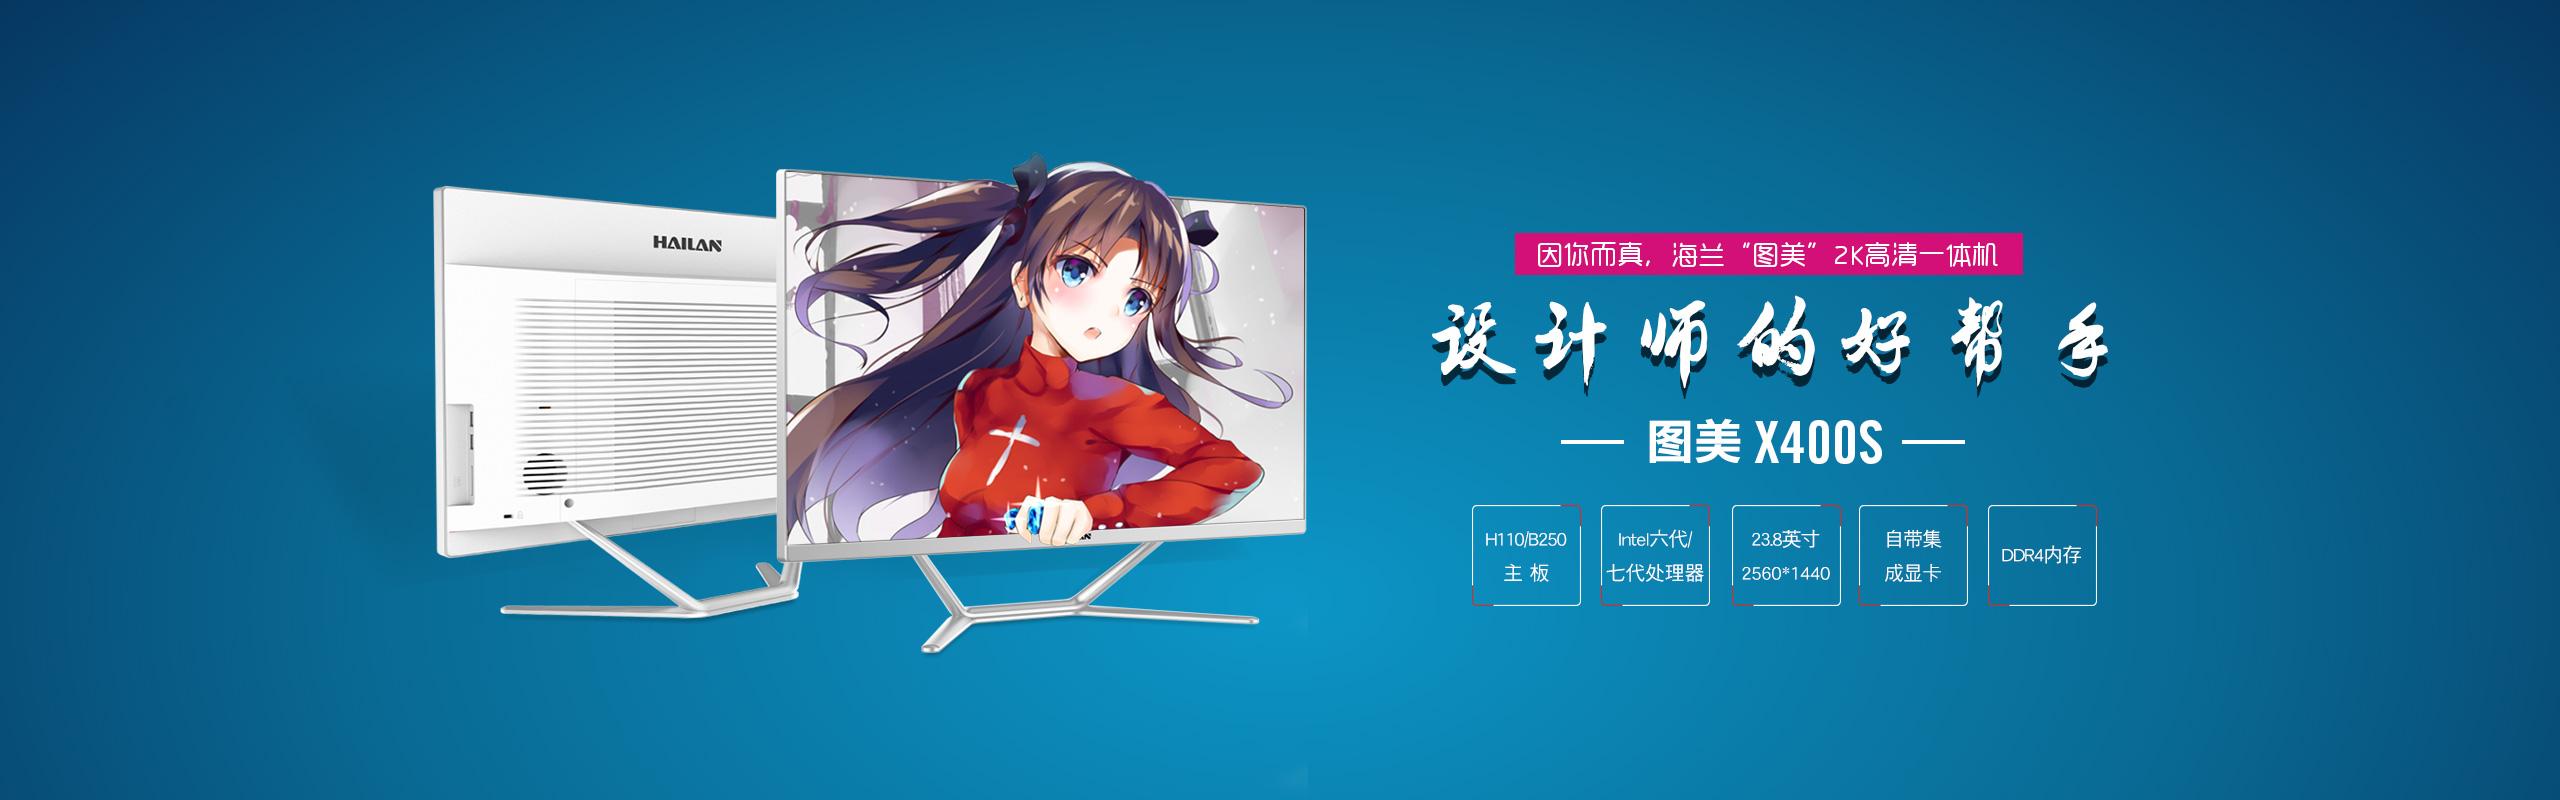 中文X400S